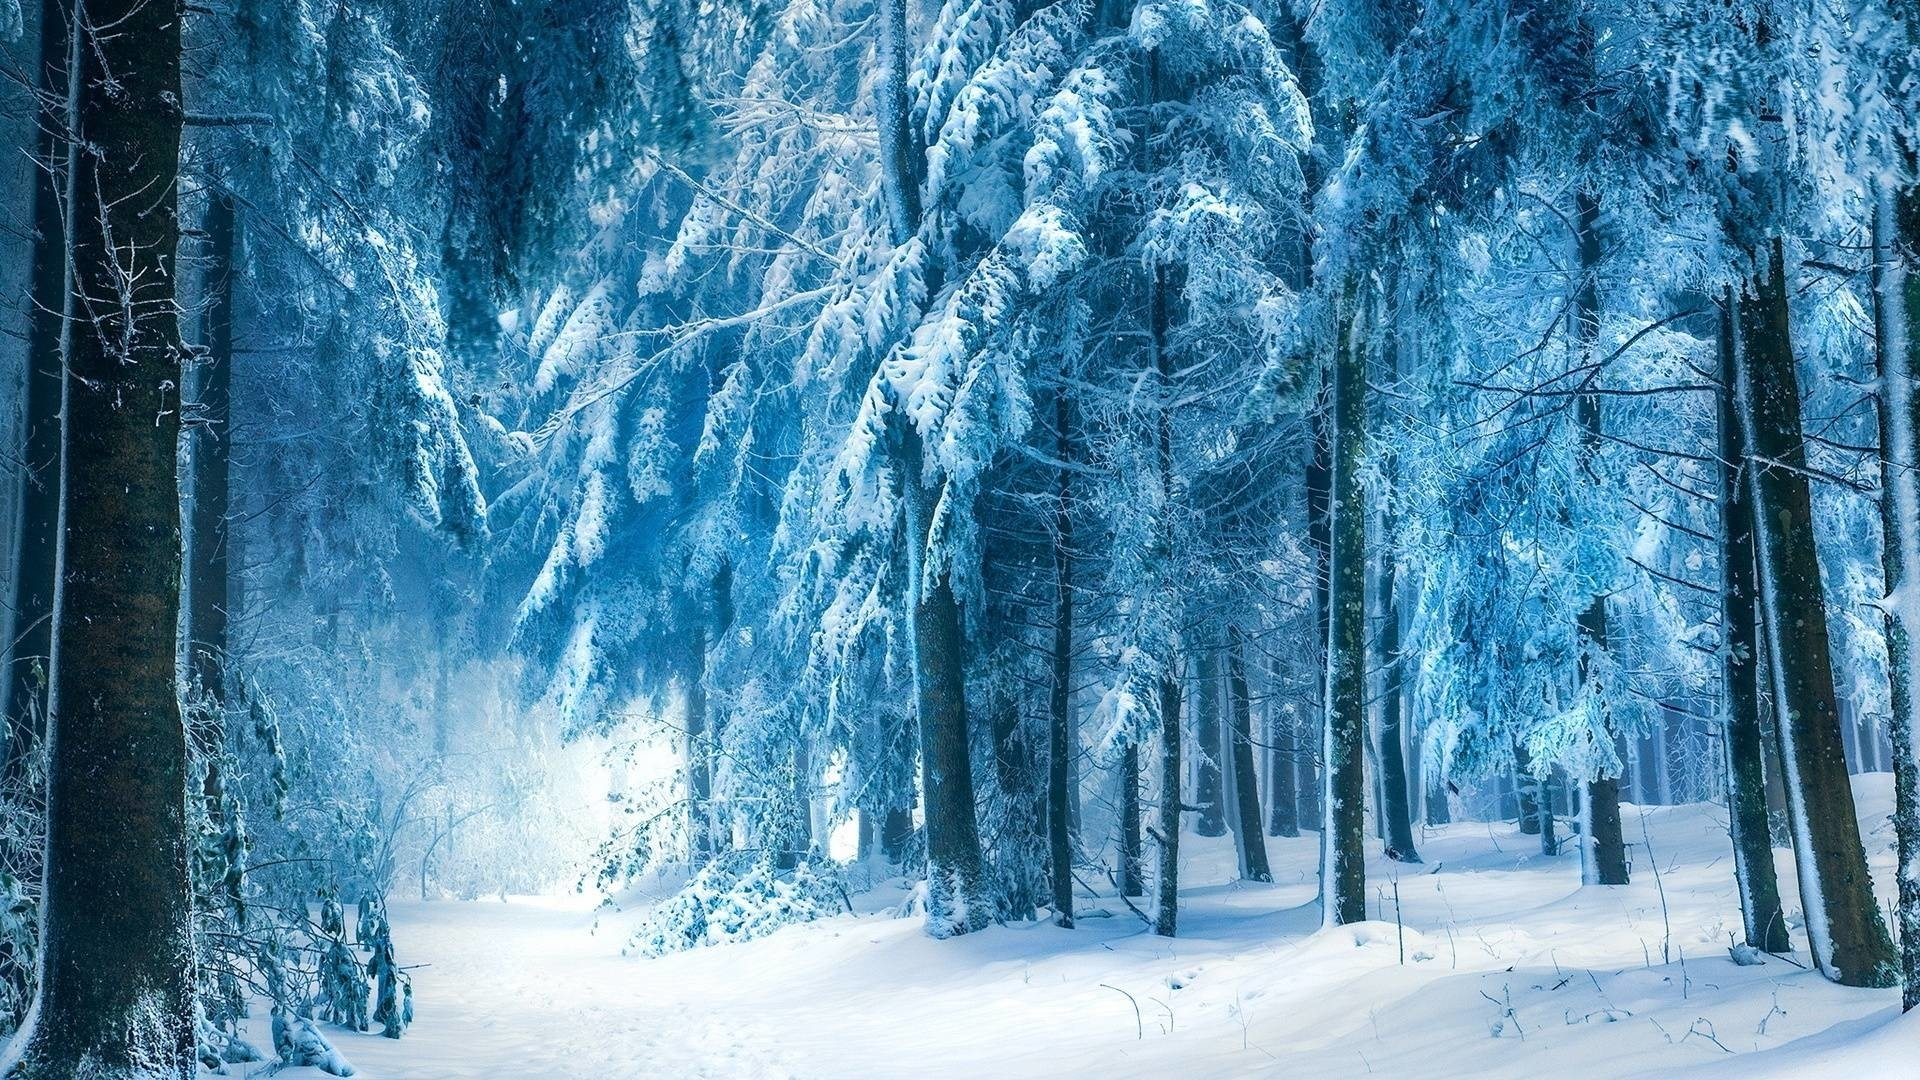 Title Snowy Dark Forest Wallpaper 1 Dimension 1920 X 1080 File Type JPG JPEG